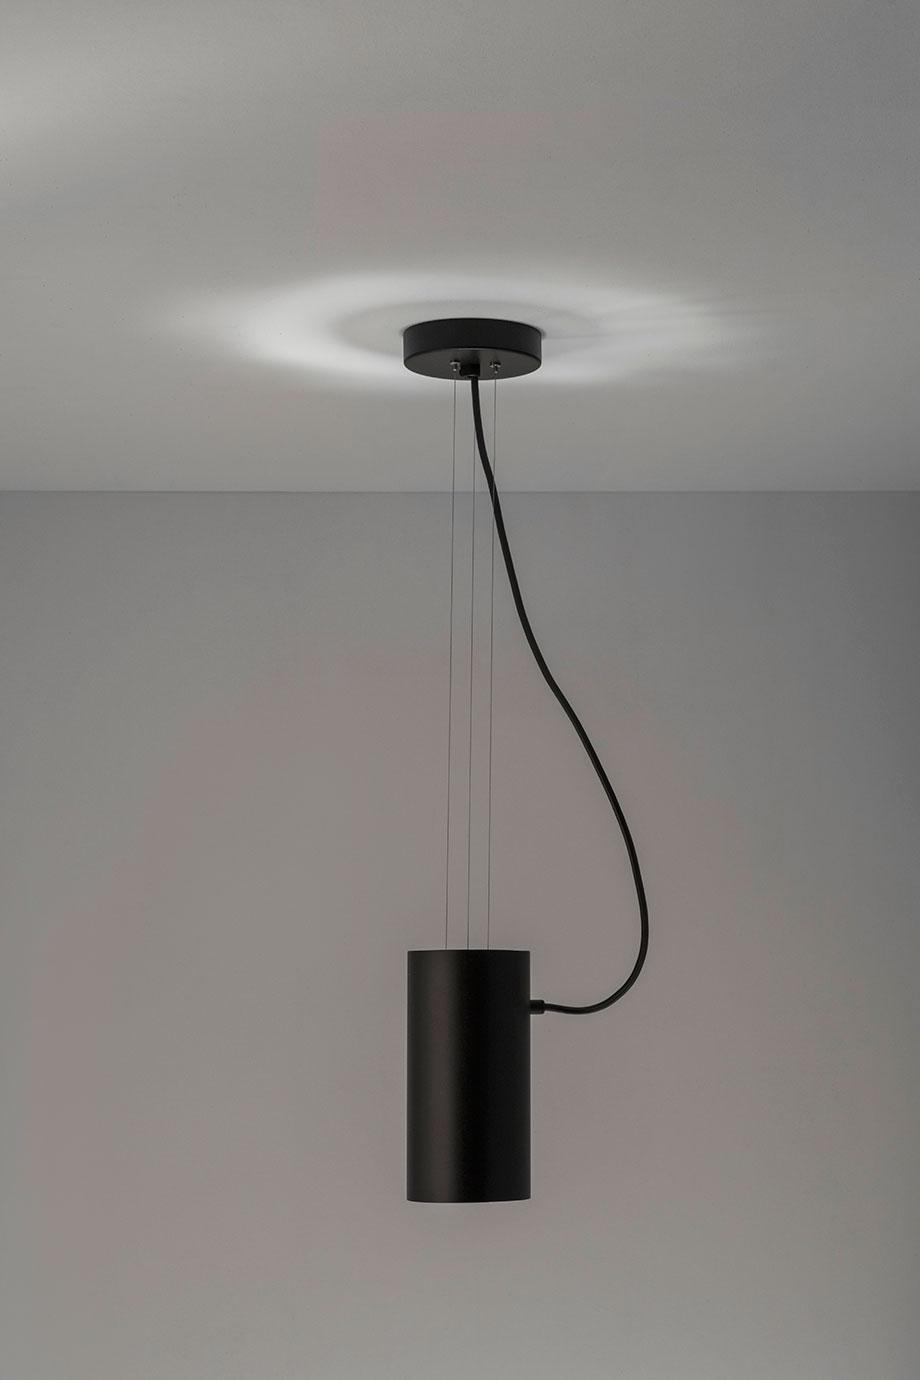 lamparas cyls de mermelada estudio para estiluz (5)